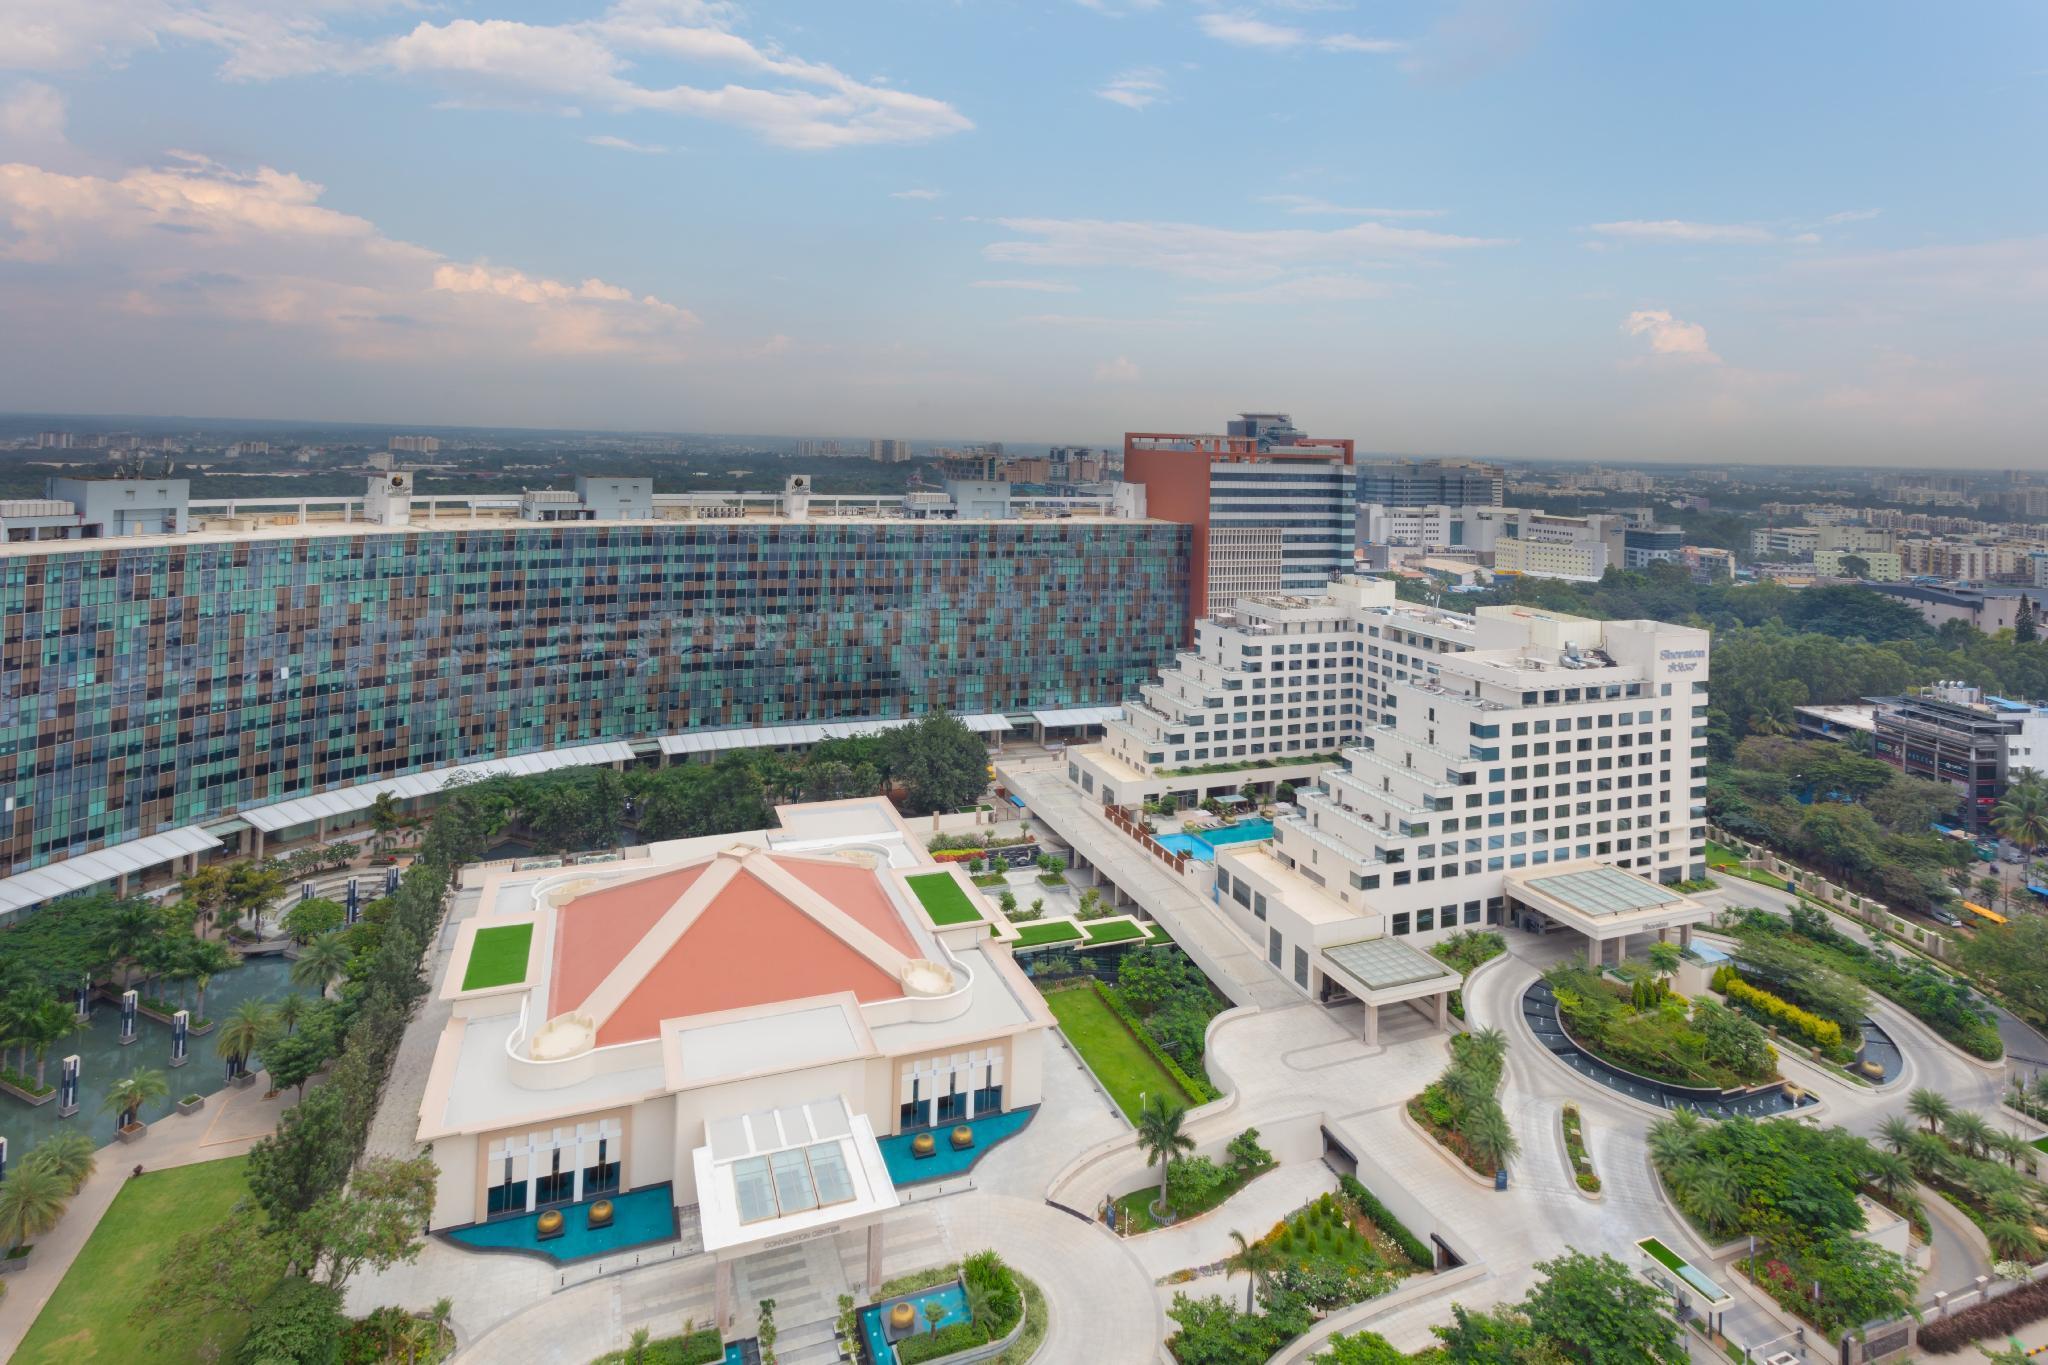 Sheraton Grand Bengaluru Whitefield Hotel And Convention Center